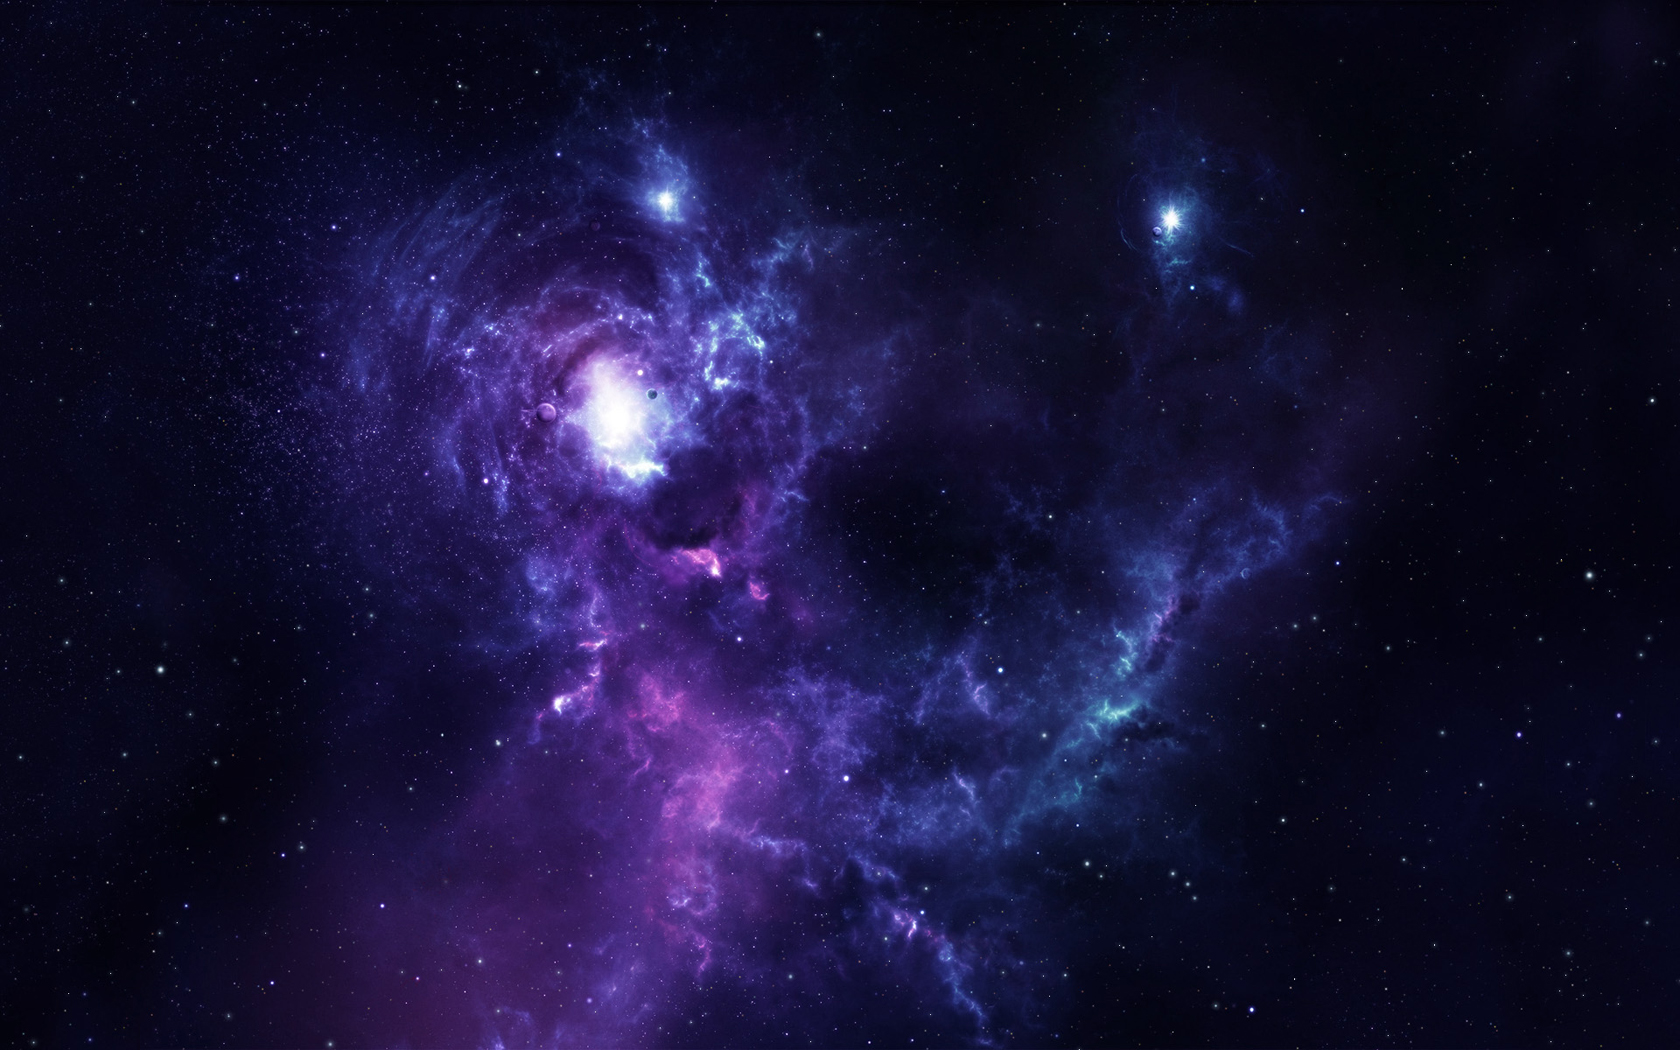 Space Colors Blue Purple Stars HD desktop wallpaper : Widescreen 1680x1050